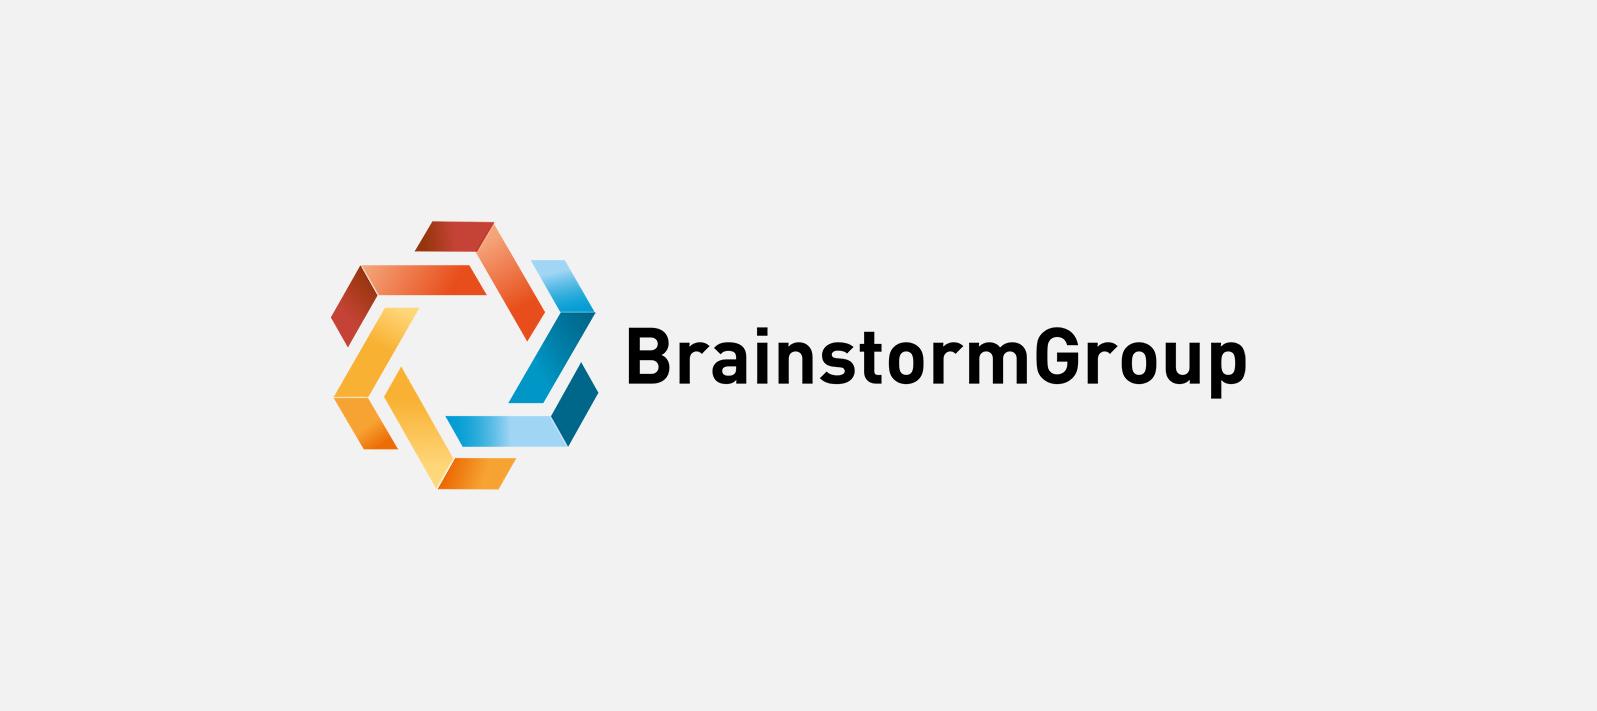 Brainstormgroup.png